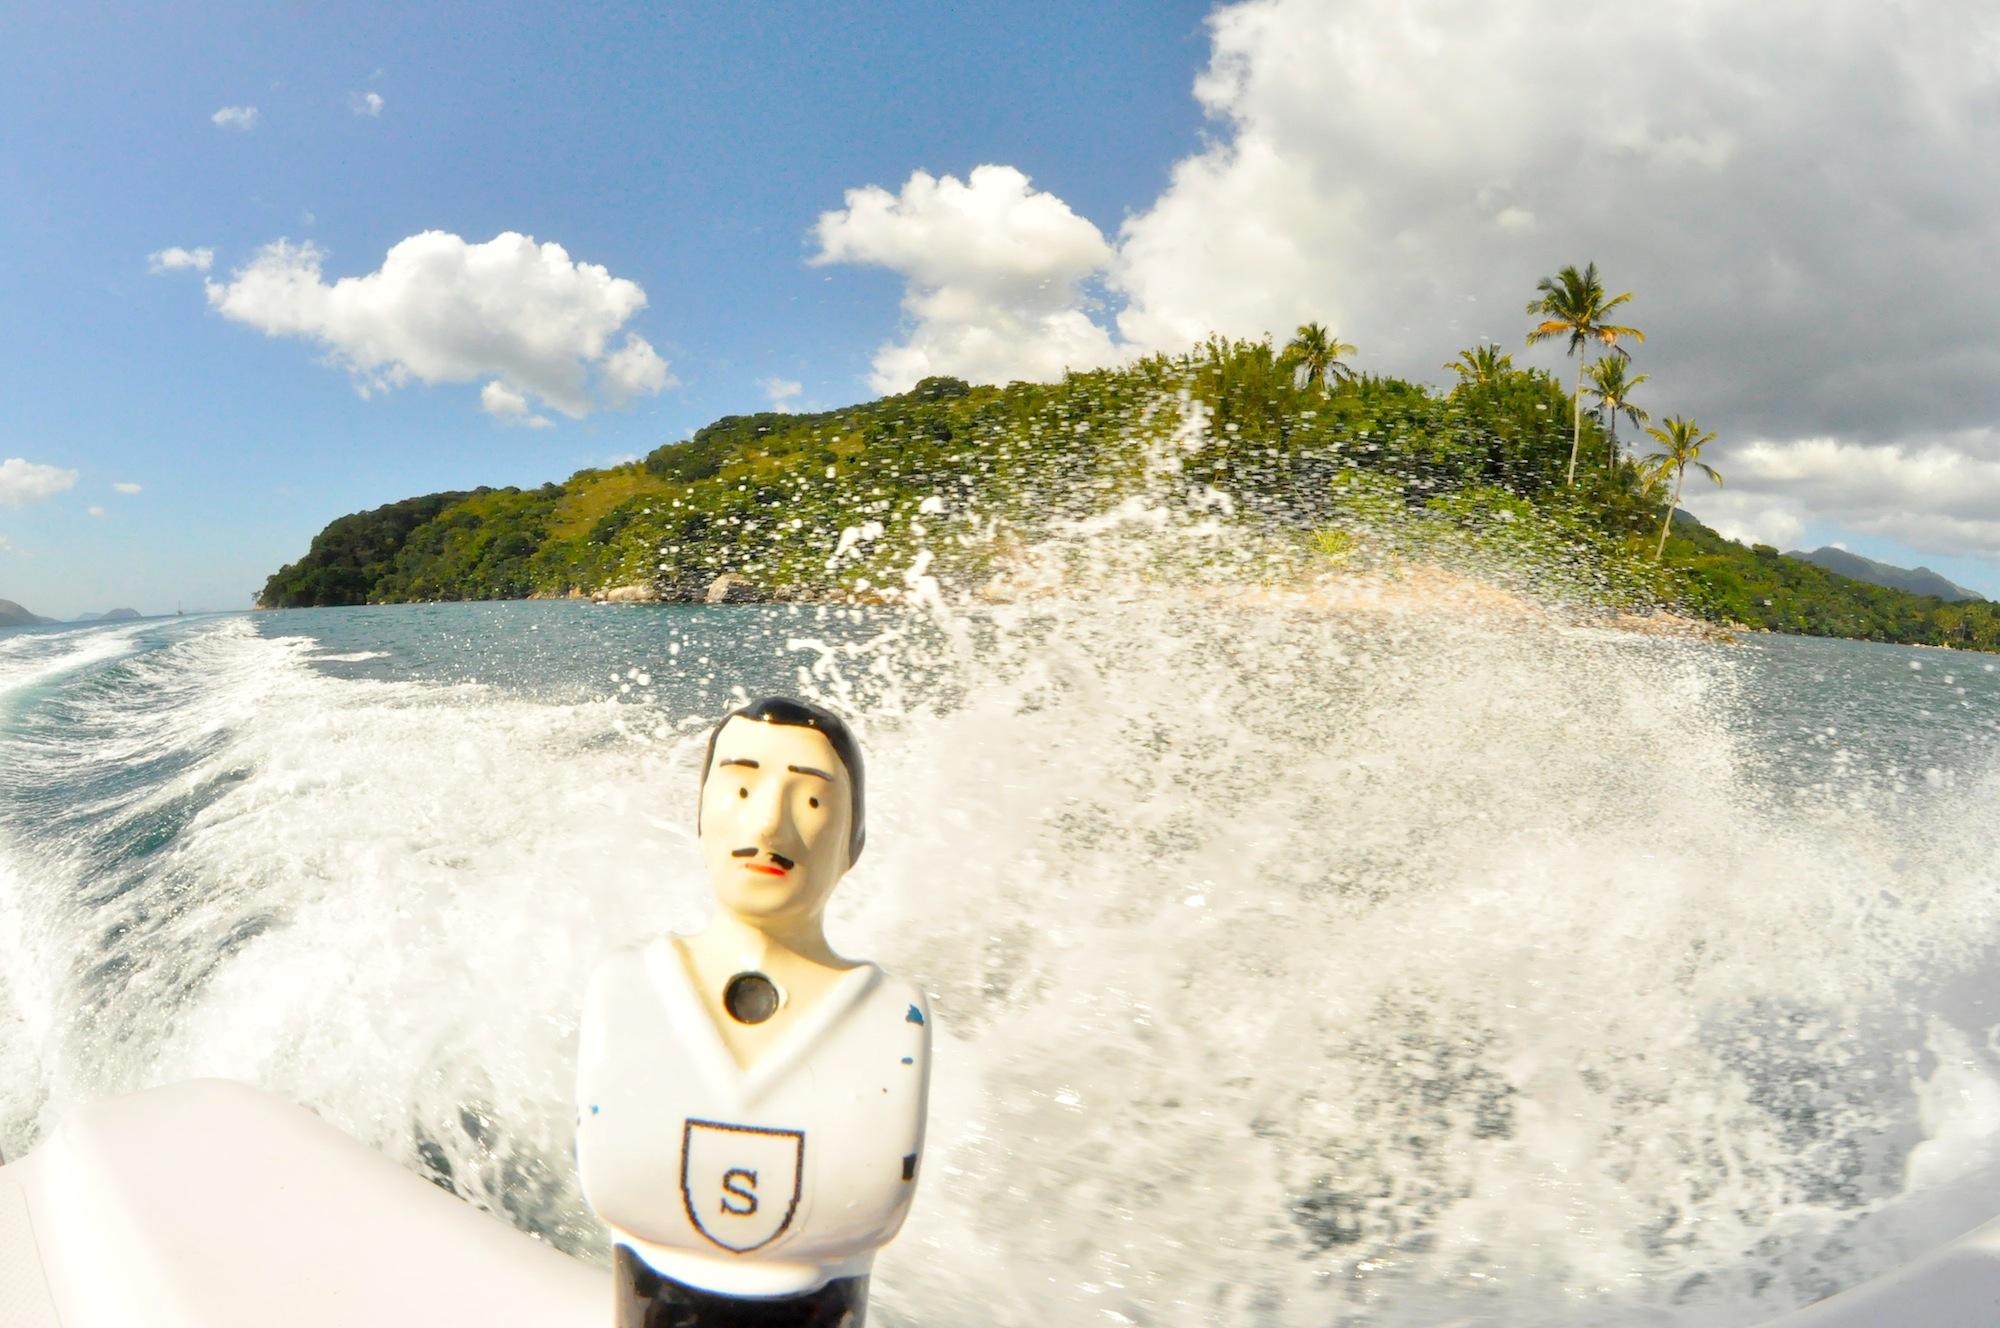 Oscar, la mascotte PKFoot pour le Mondial